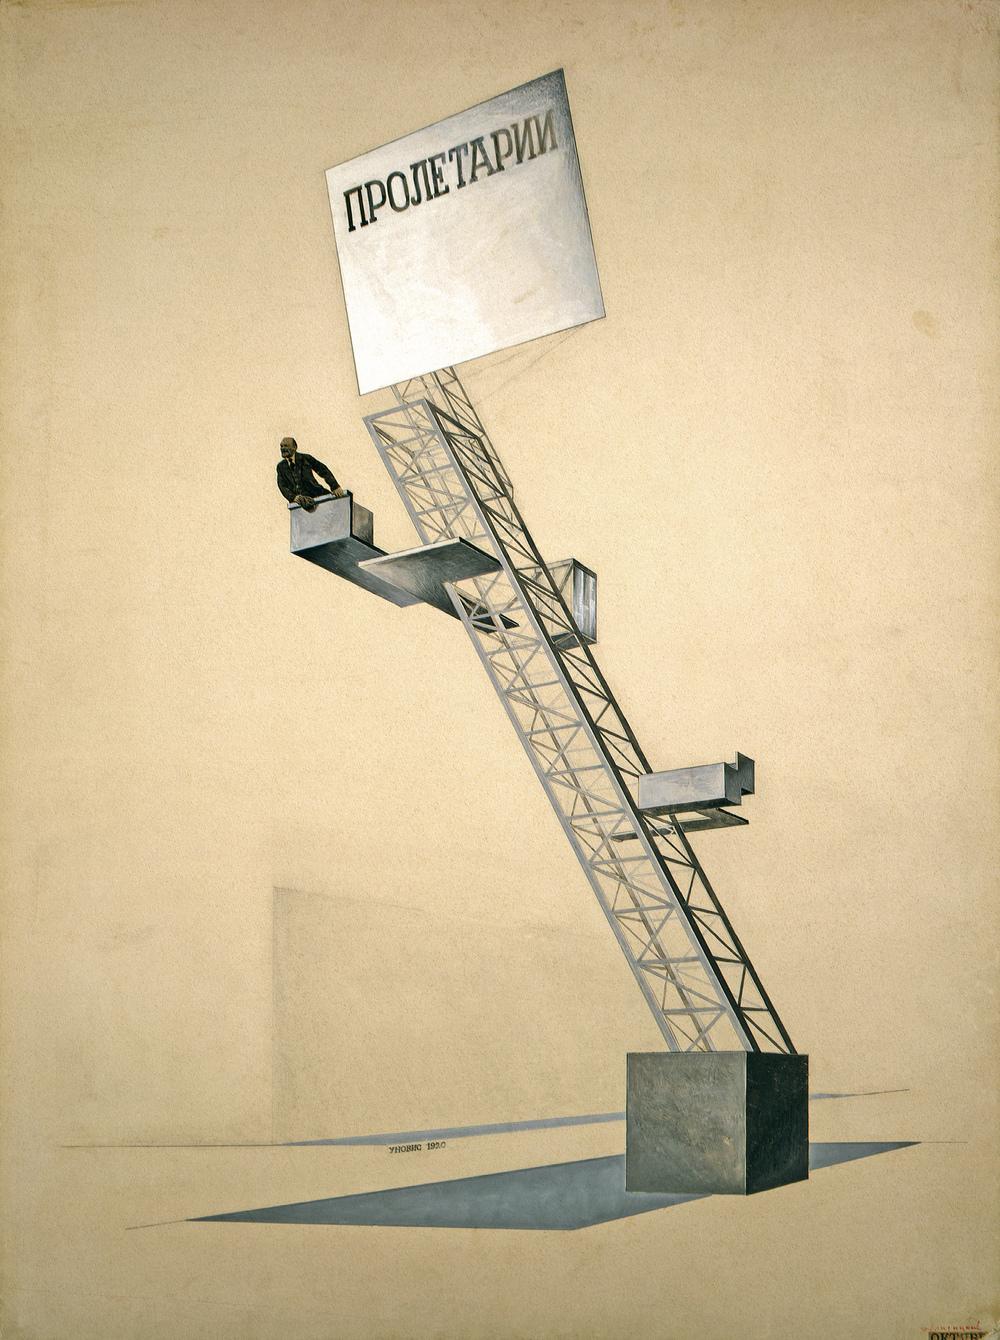 El Lissitzky,  Lenin Tribune , 1920. State Tretyakov Gallery, Moscow.